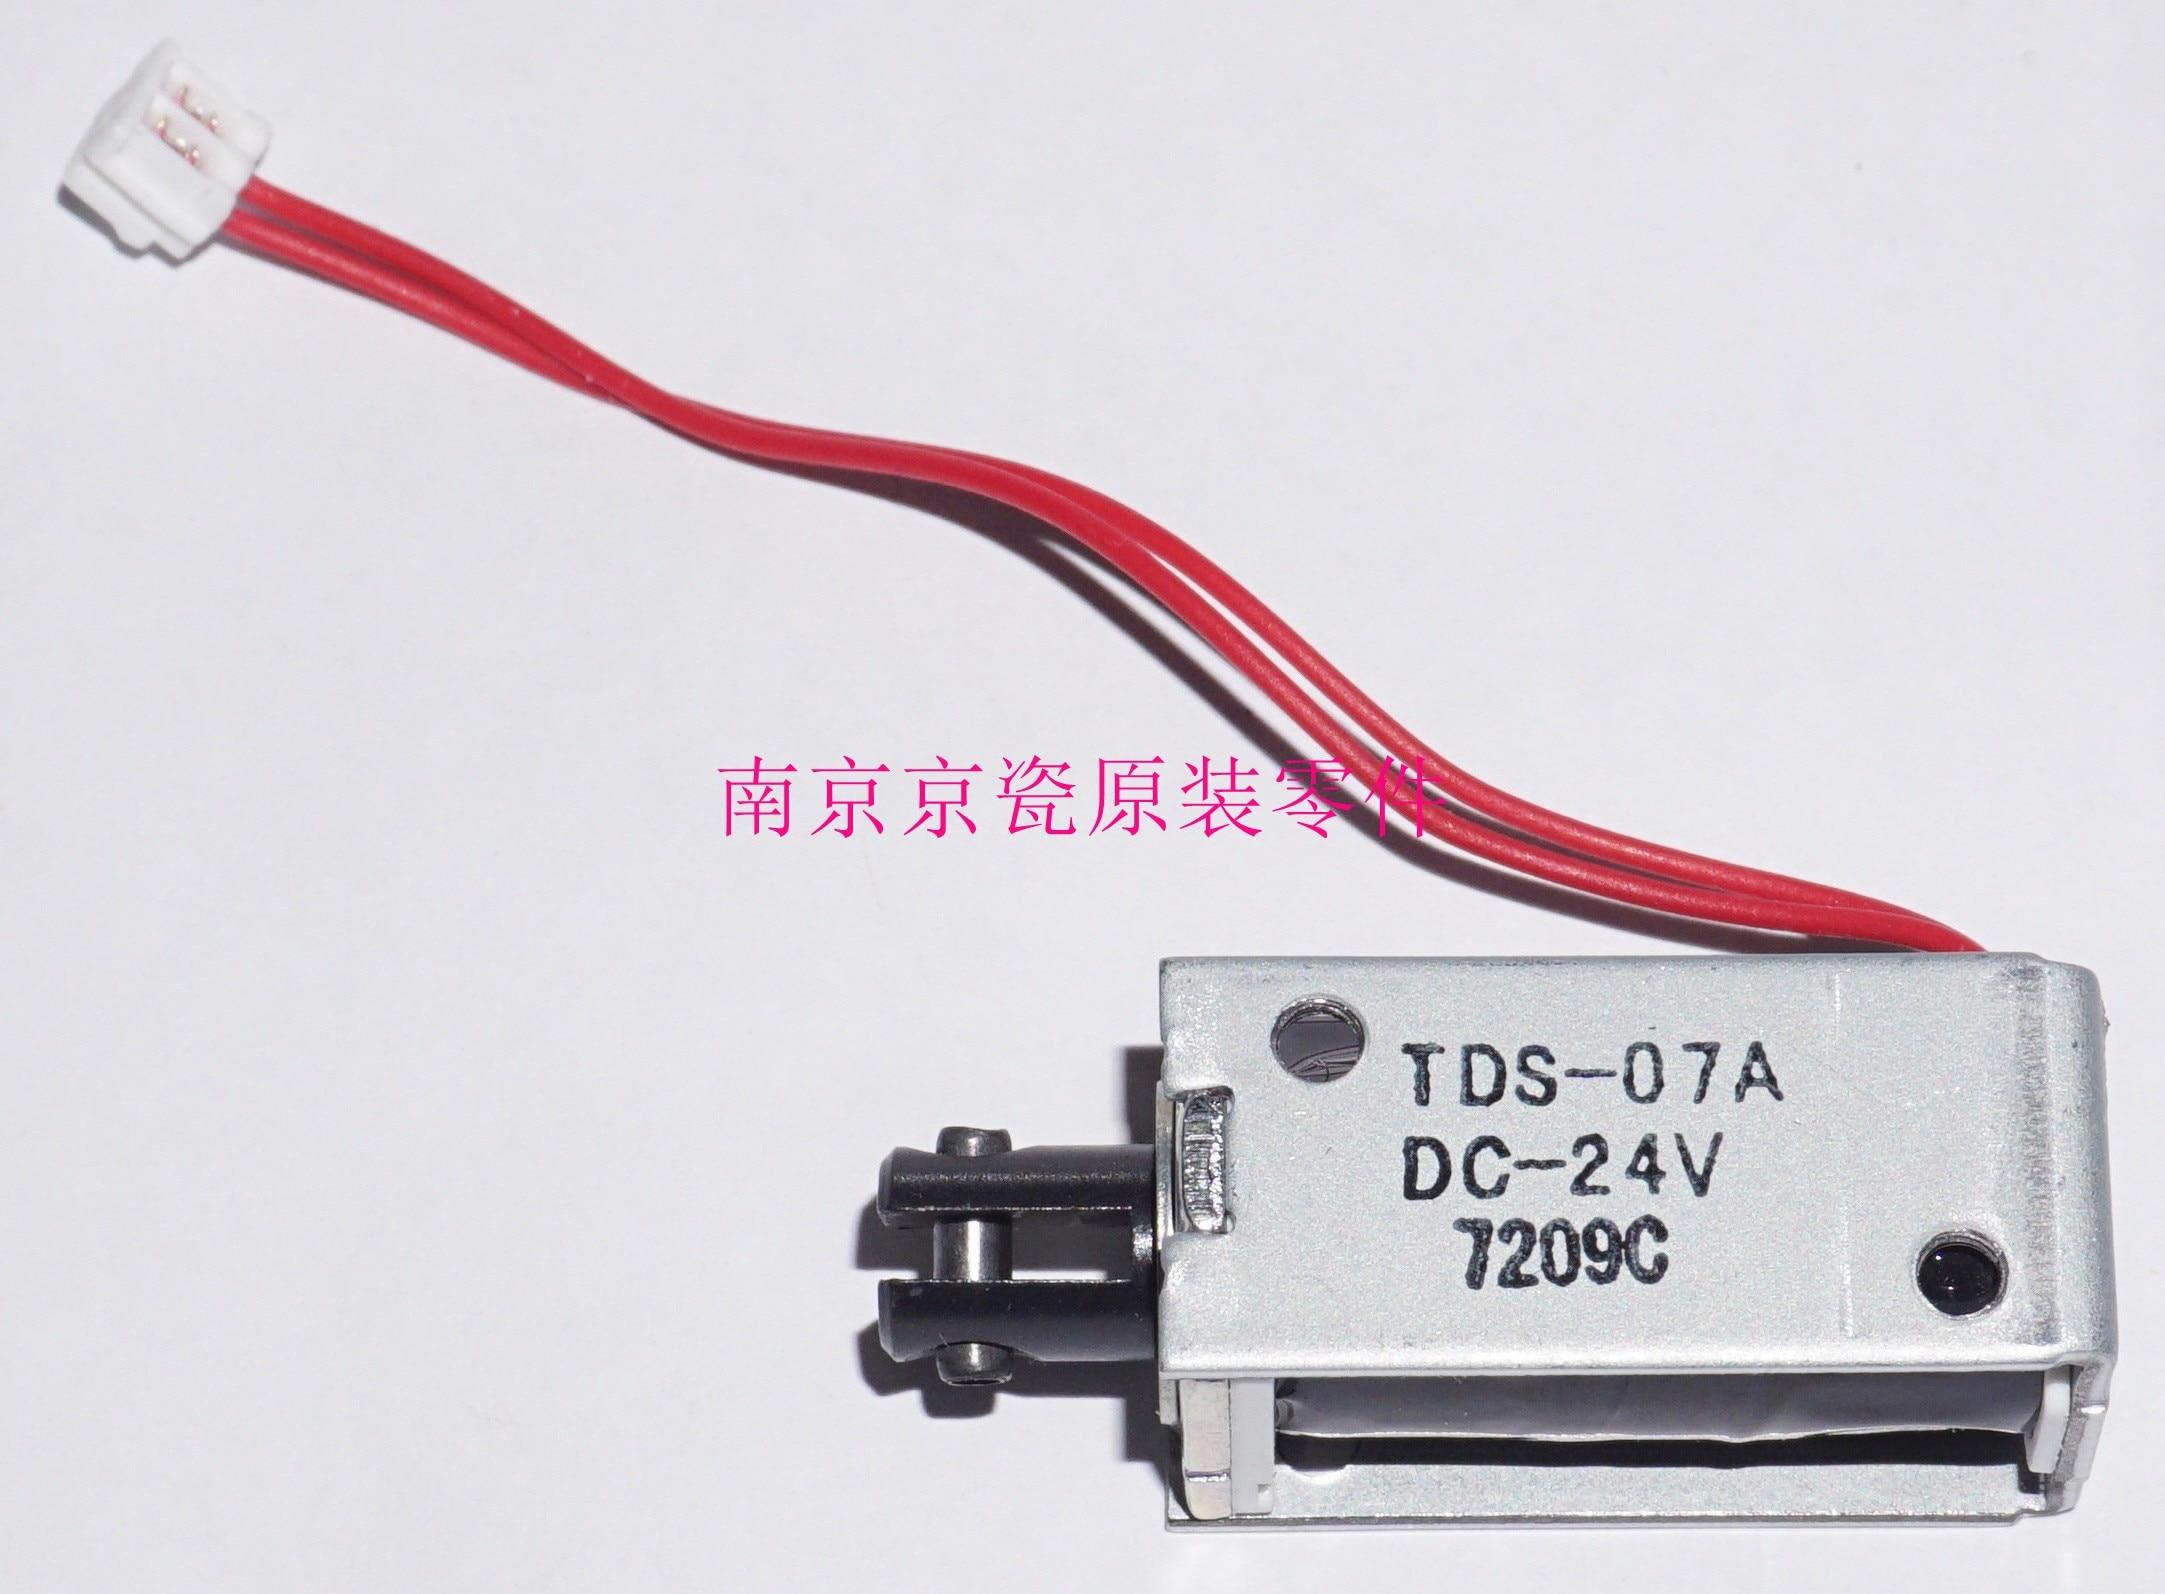 Nuevo Original Kyocera 303NM44010 solenoide JS para TASKalfa 6500i-8001i 4002i-8002i 6550ci-7551ci 2552ci-8052ci